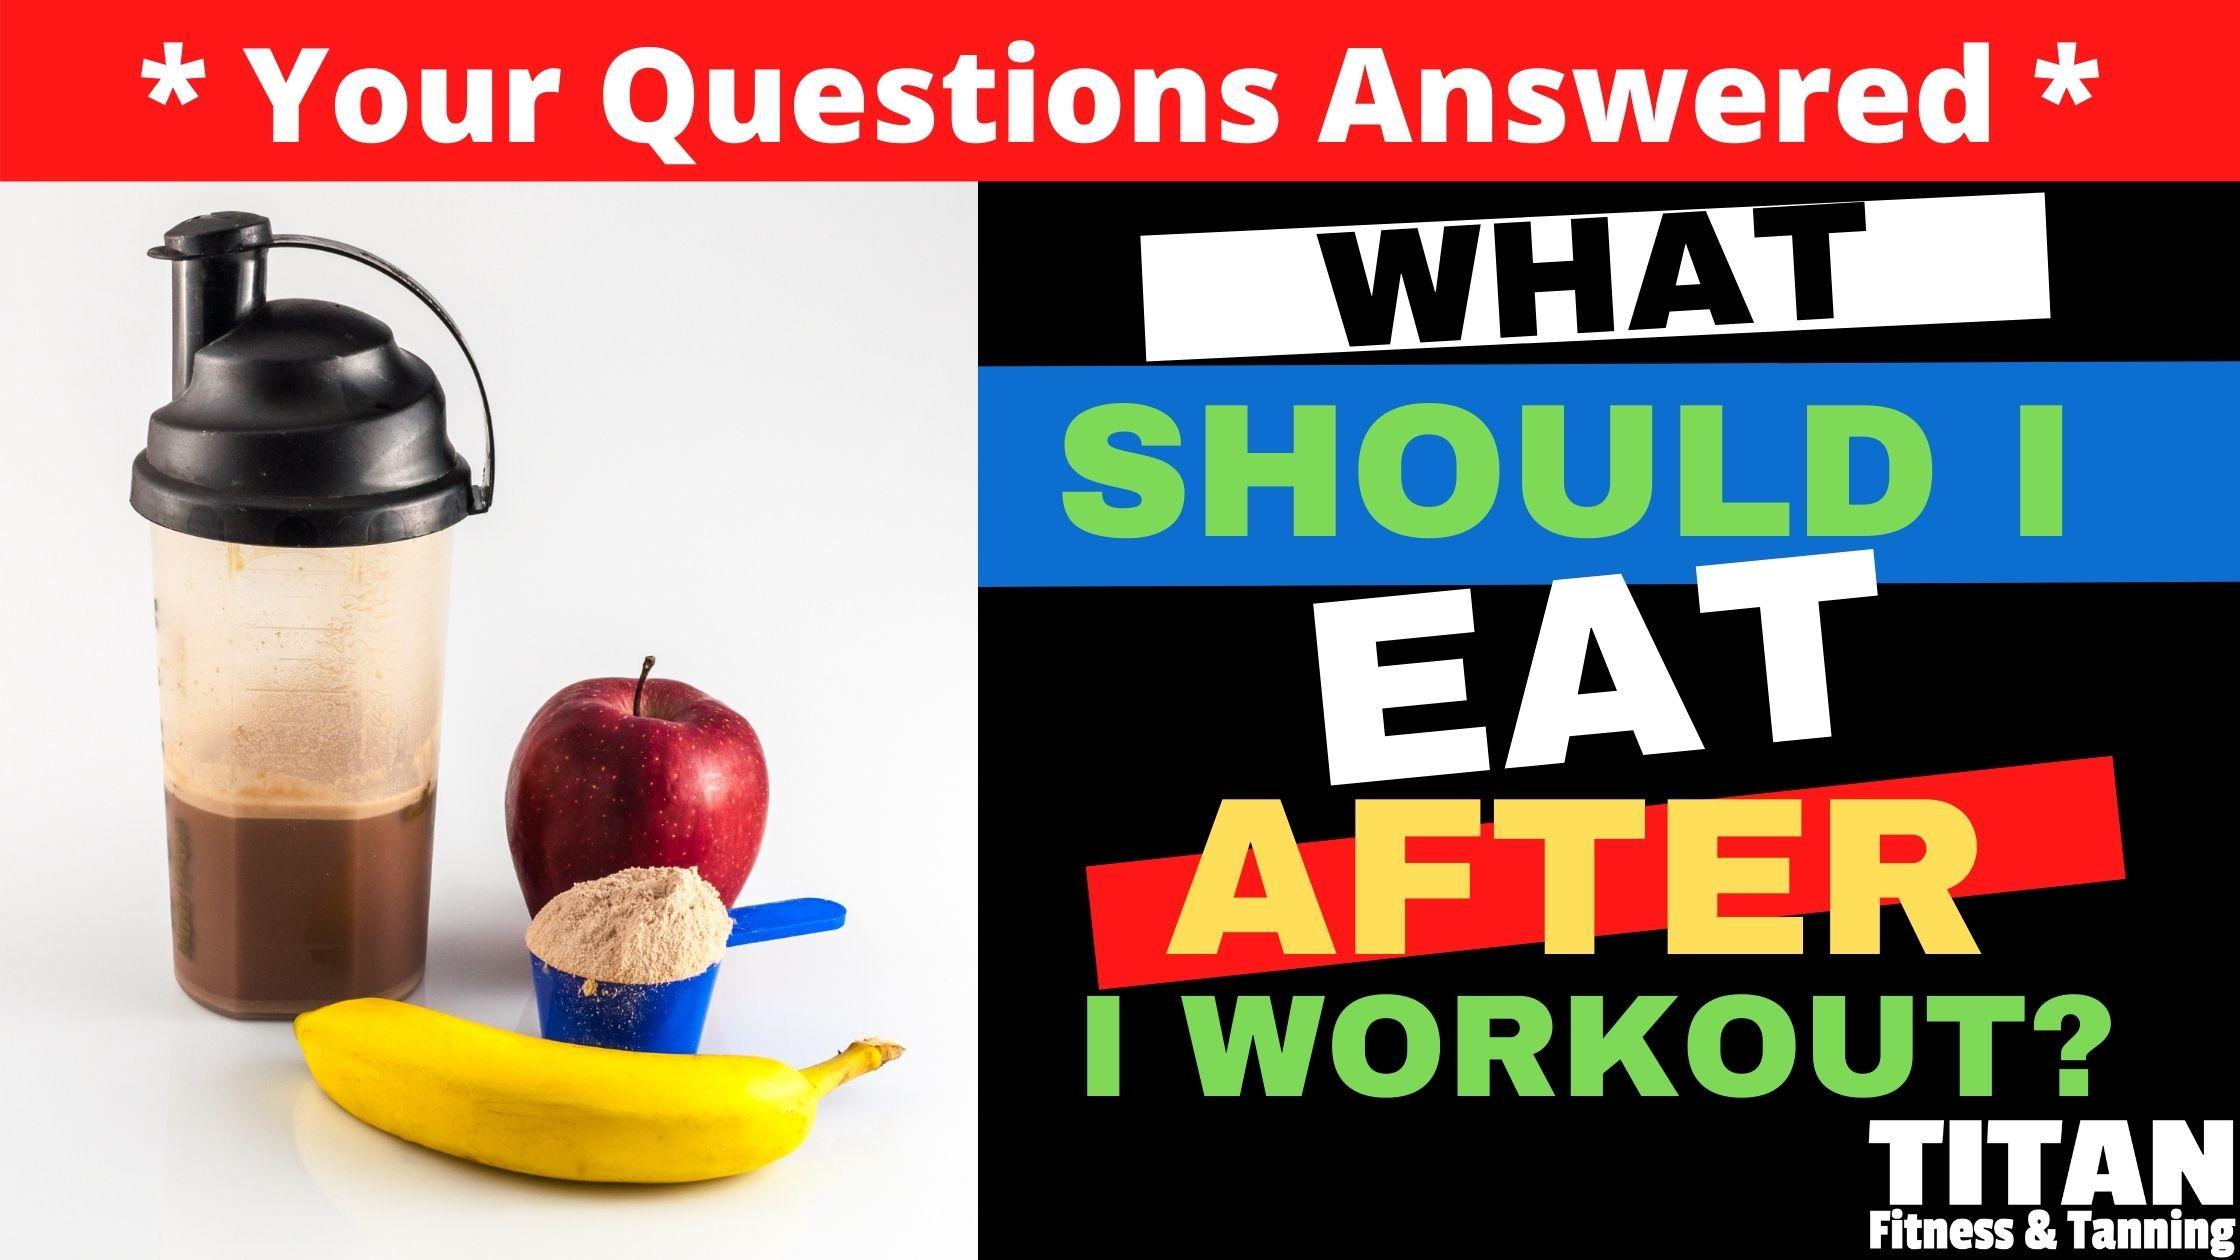 What Should I Eat After I Workout